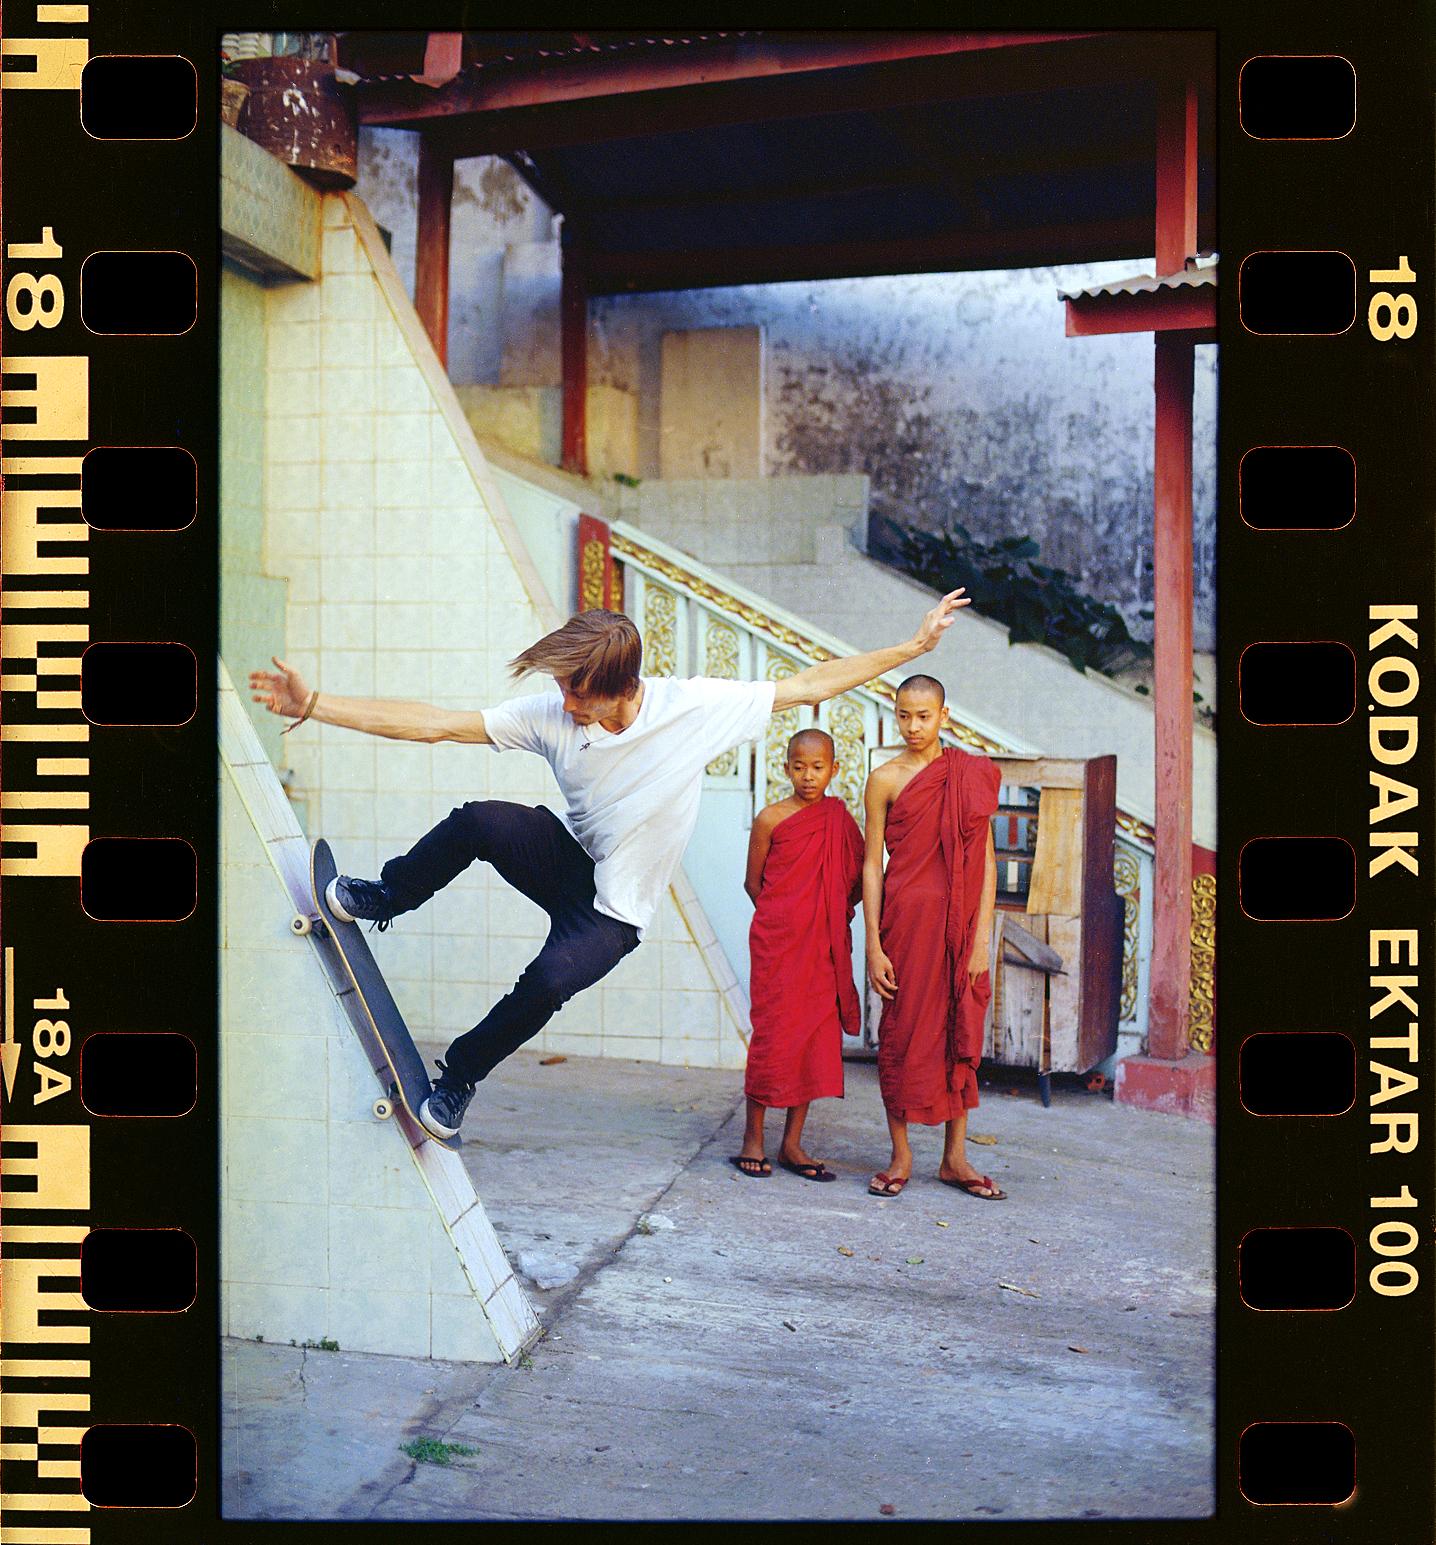 35mmPatrikWallner_Yangon_ZvereffVerticalTempleGrinding